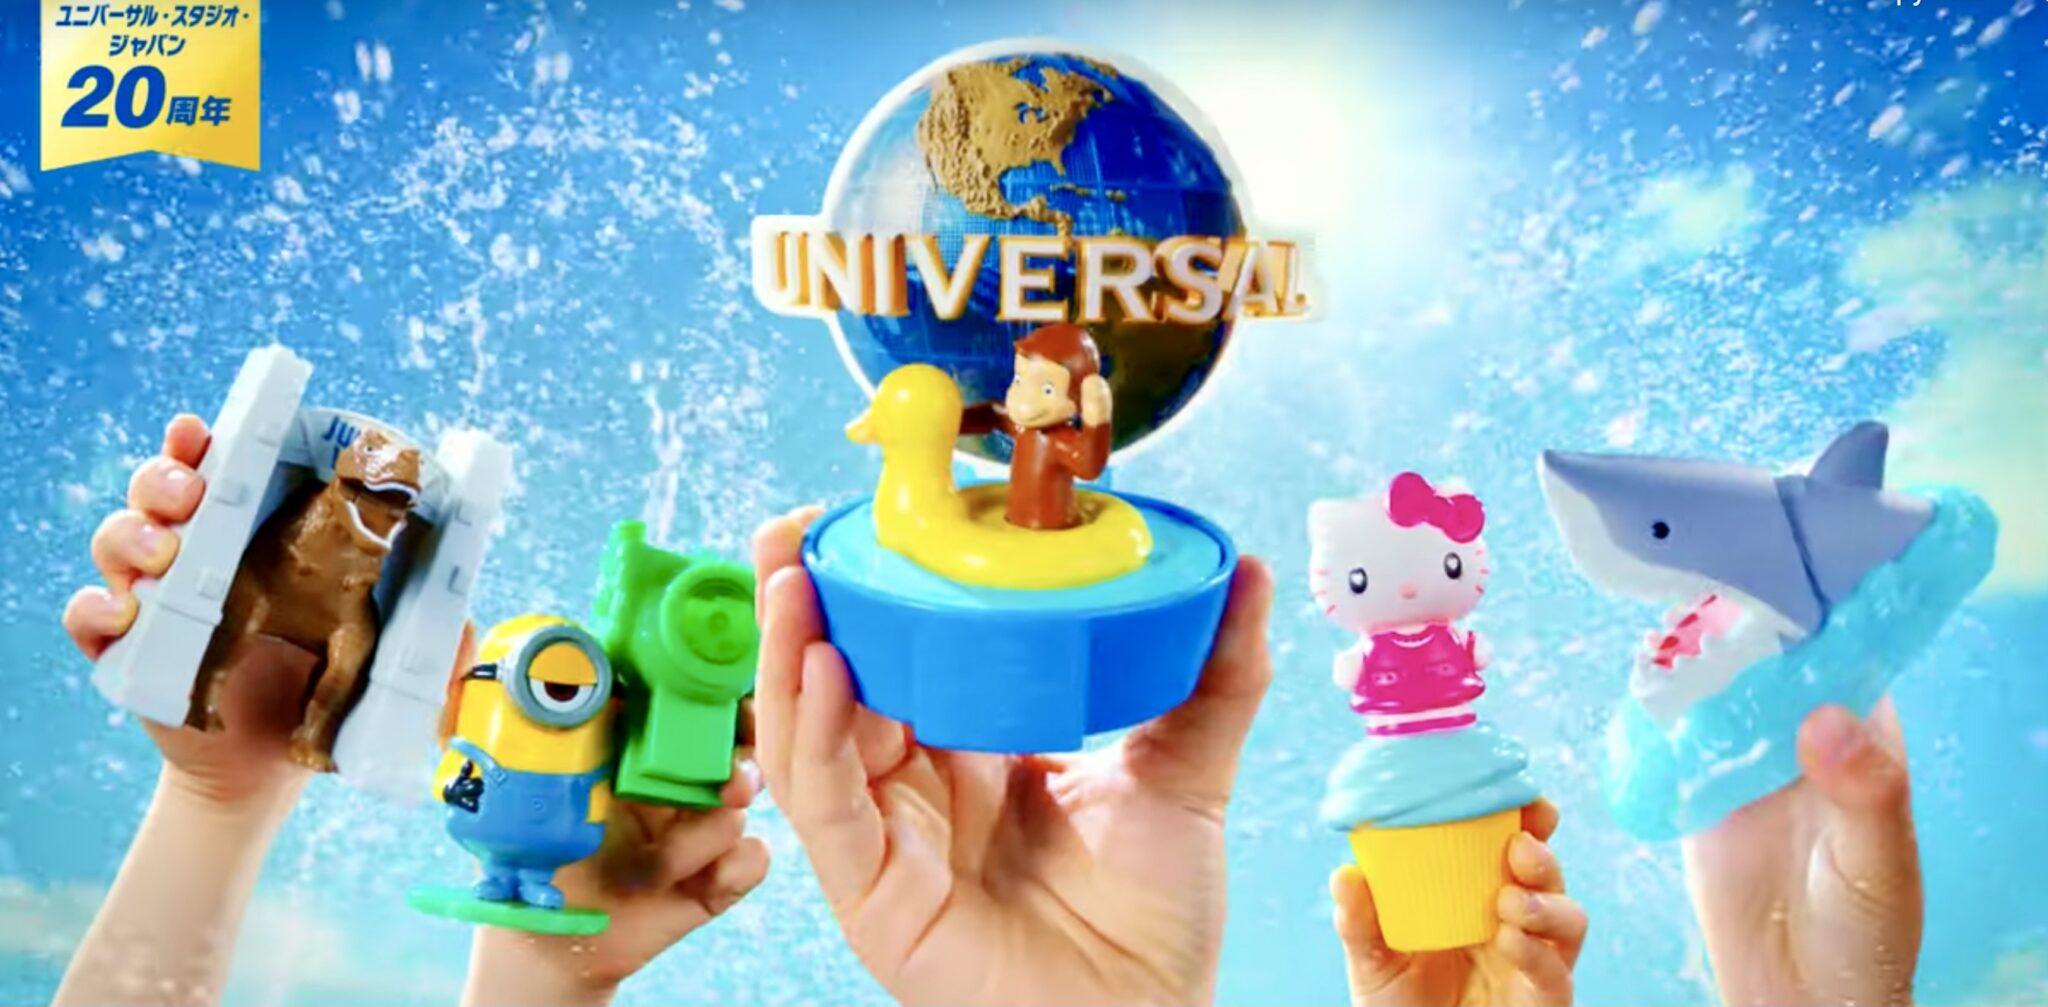 Universal Studios Japan McDonald's Japan Happy Set Toys